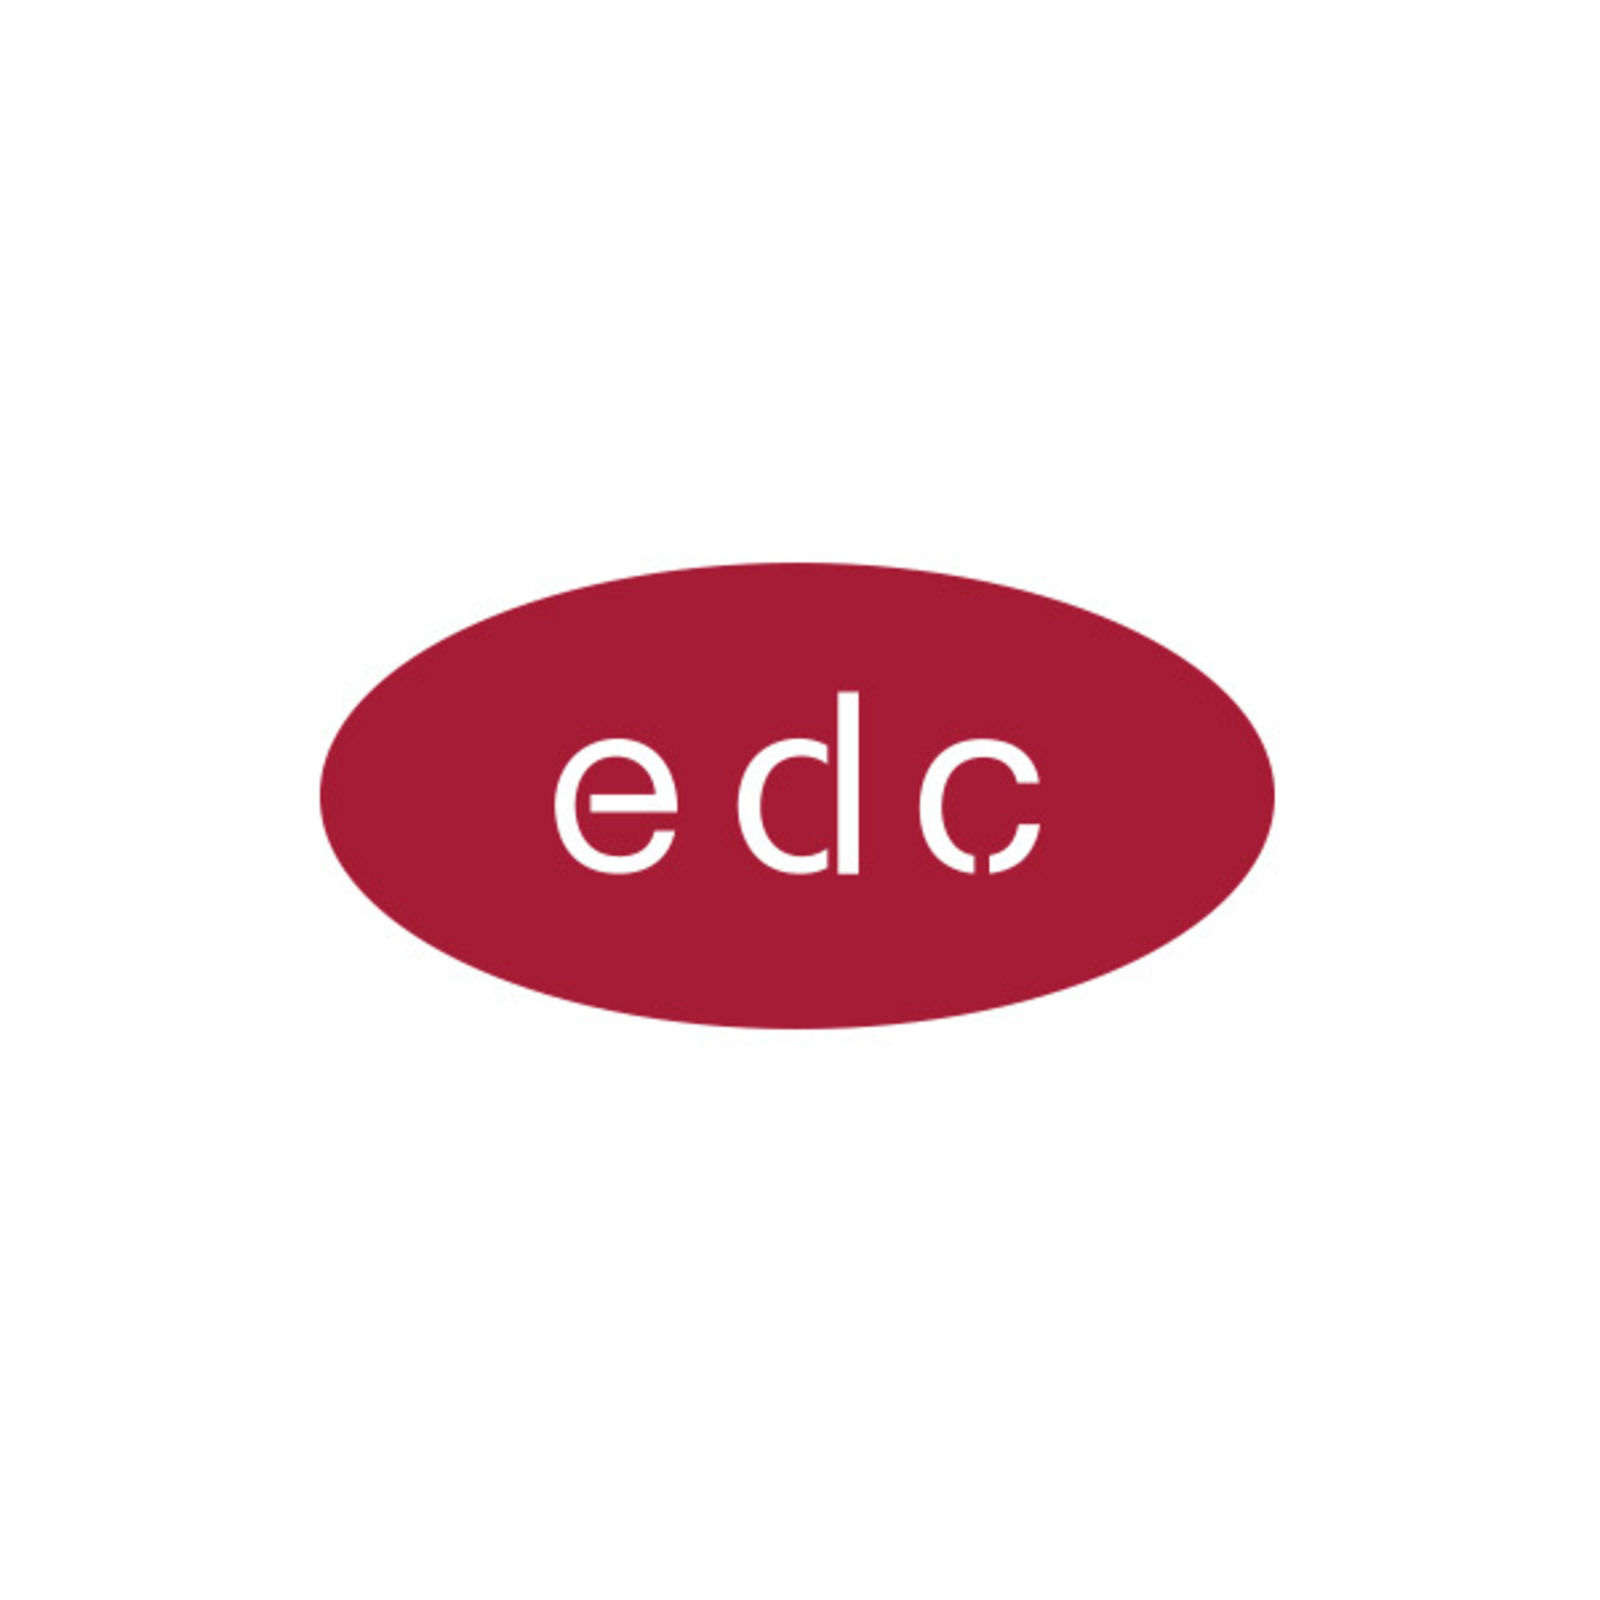 edc by ESPRIT (Image 1)